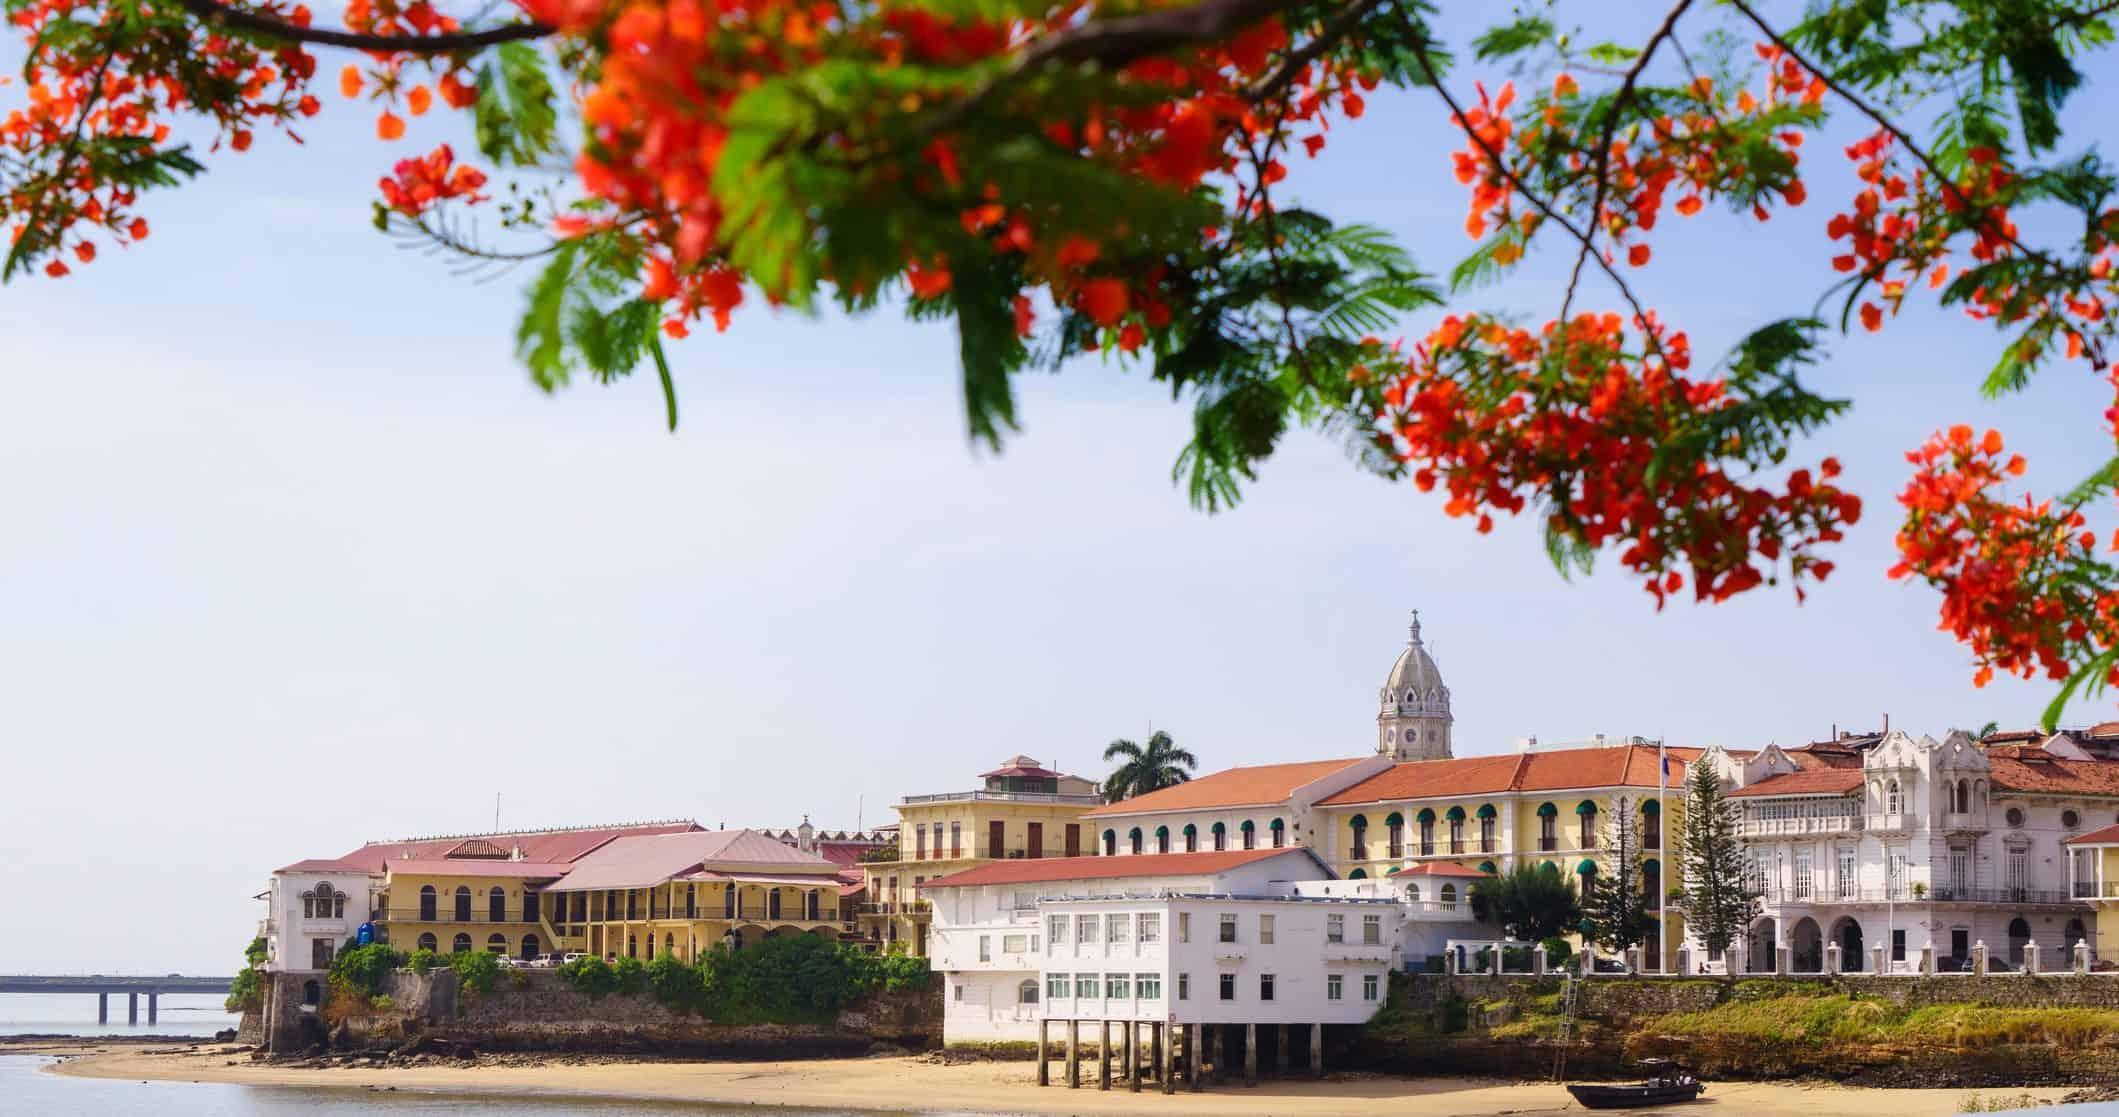 View of Casco Viejo in Panama City, Panama